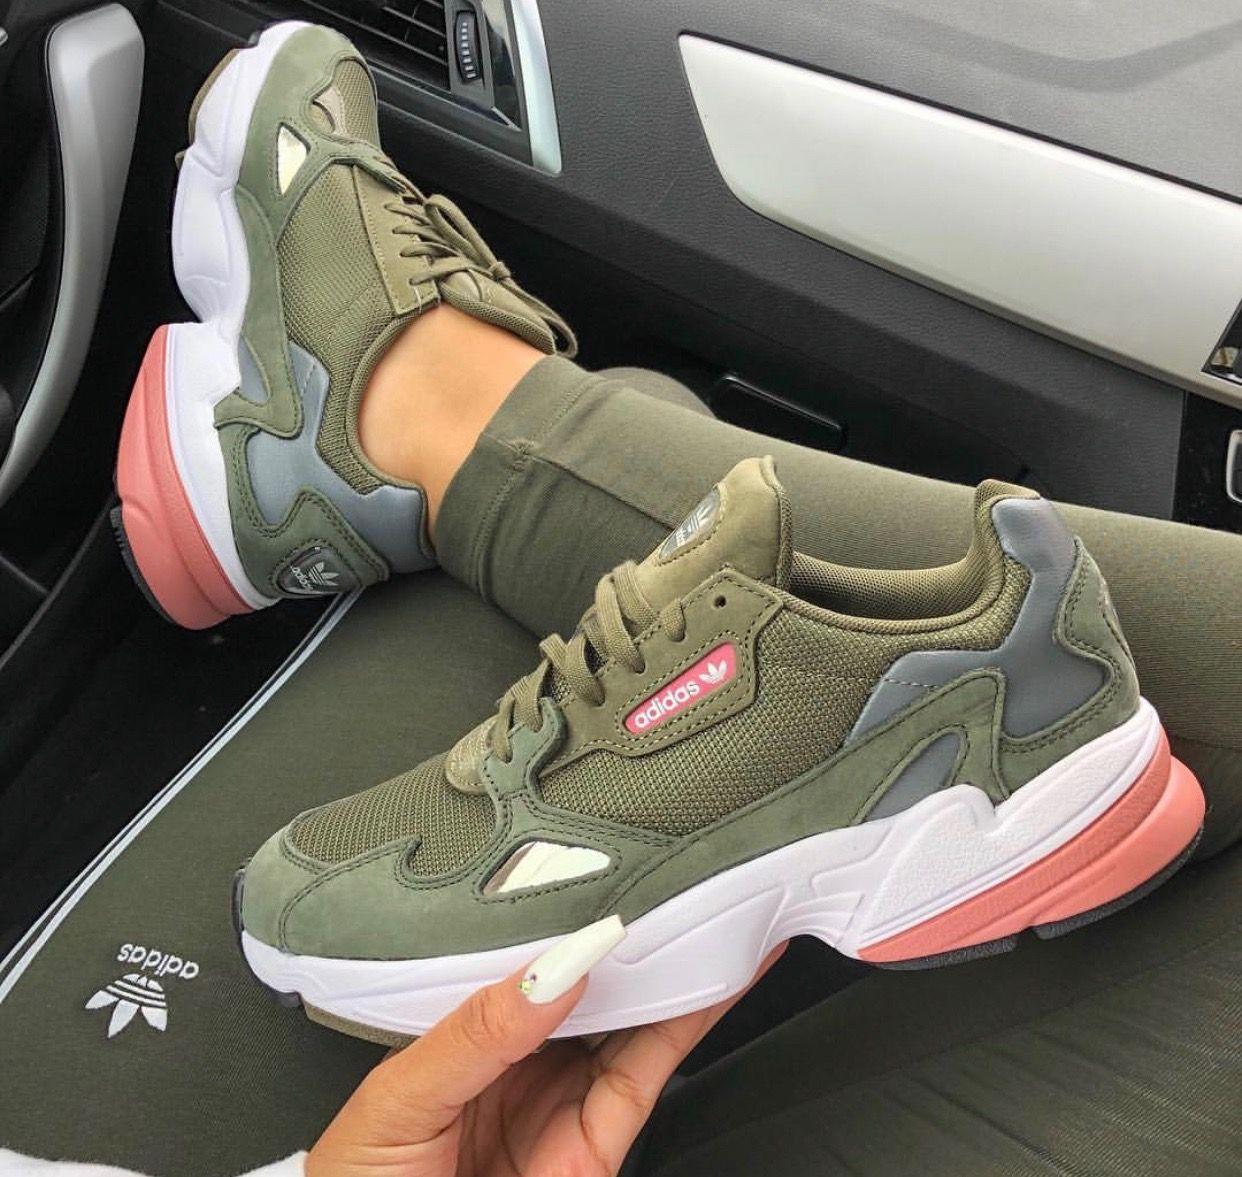 Tenis 2019 Con Verde Fondo MilitardanielagEn Adidas 8w0OvNnm